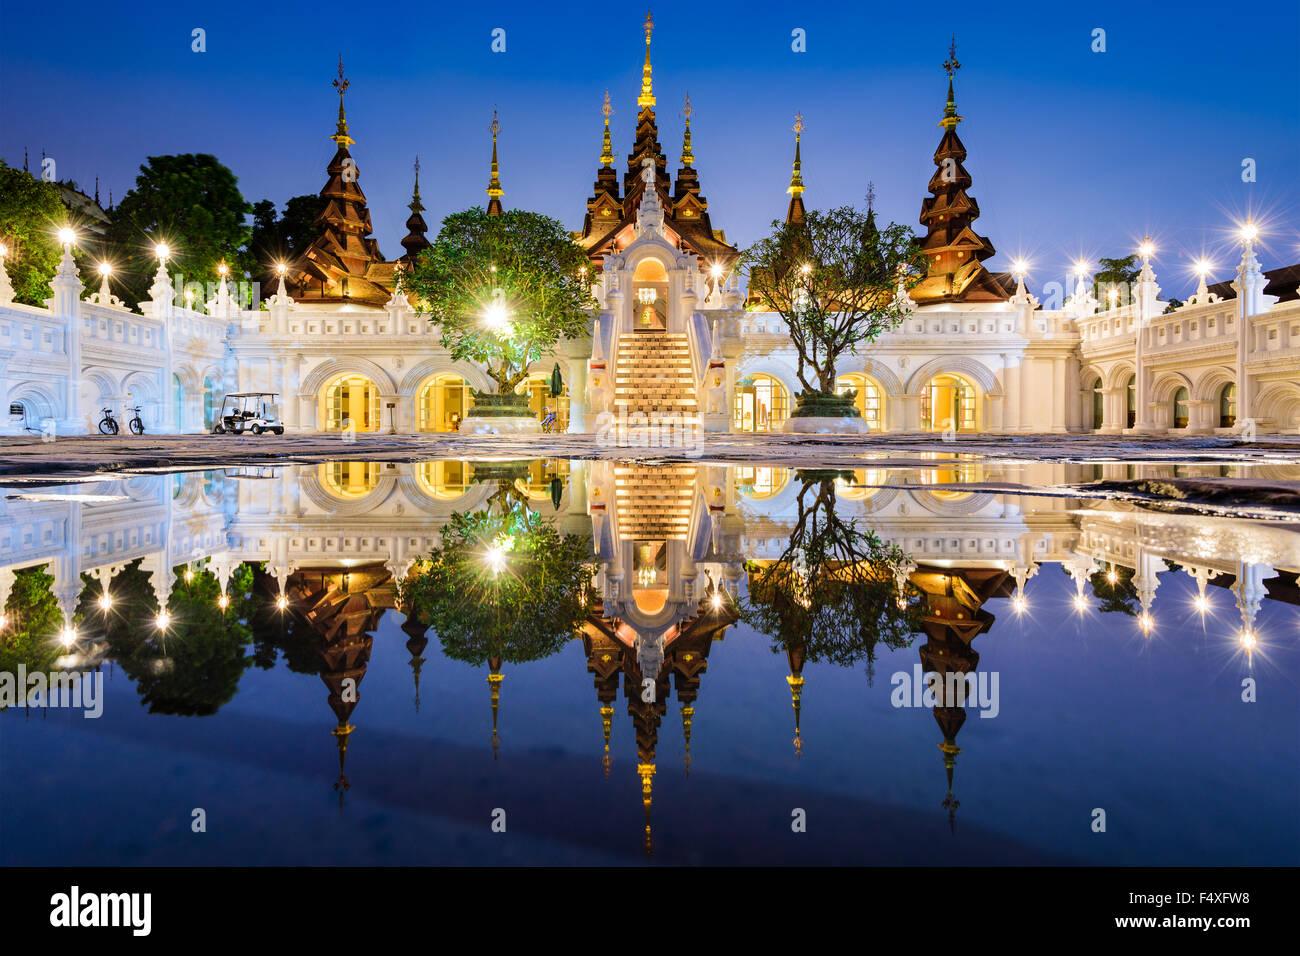 Castle hotel stockfotos castle hotel bilder alamy for Traditionelles thai haus